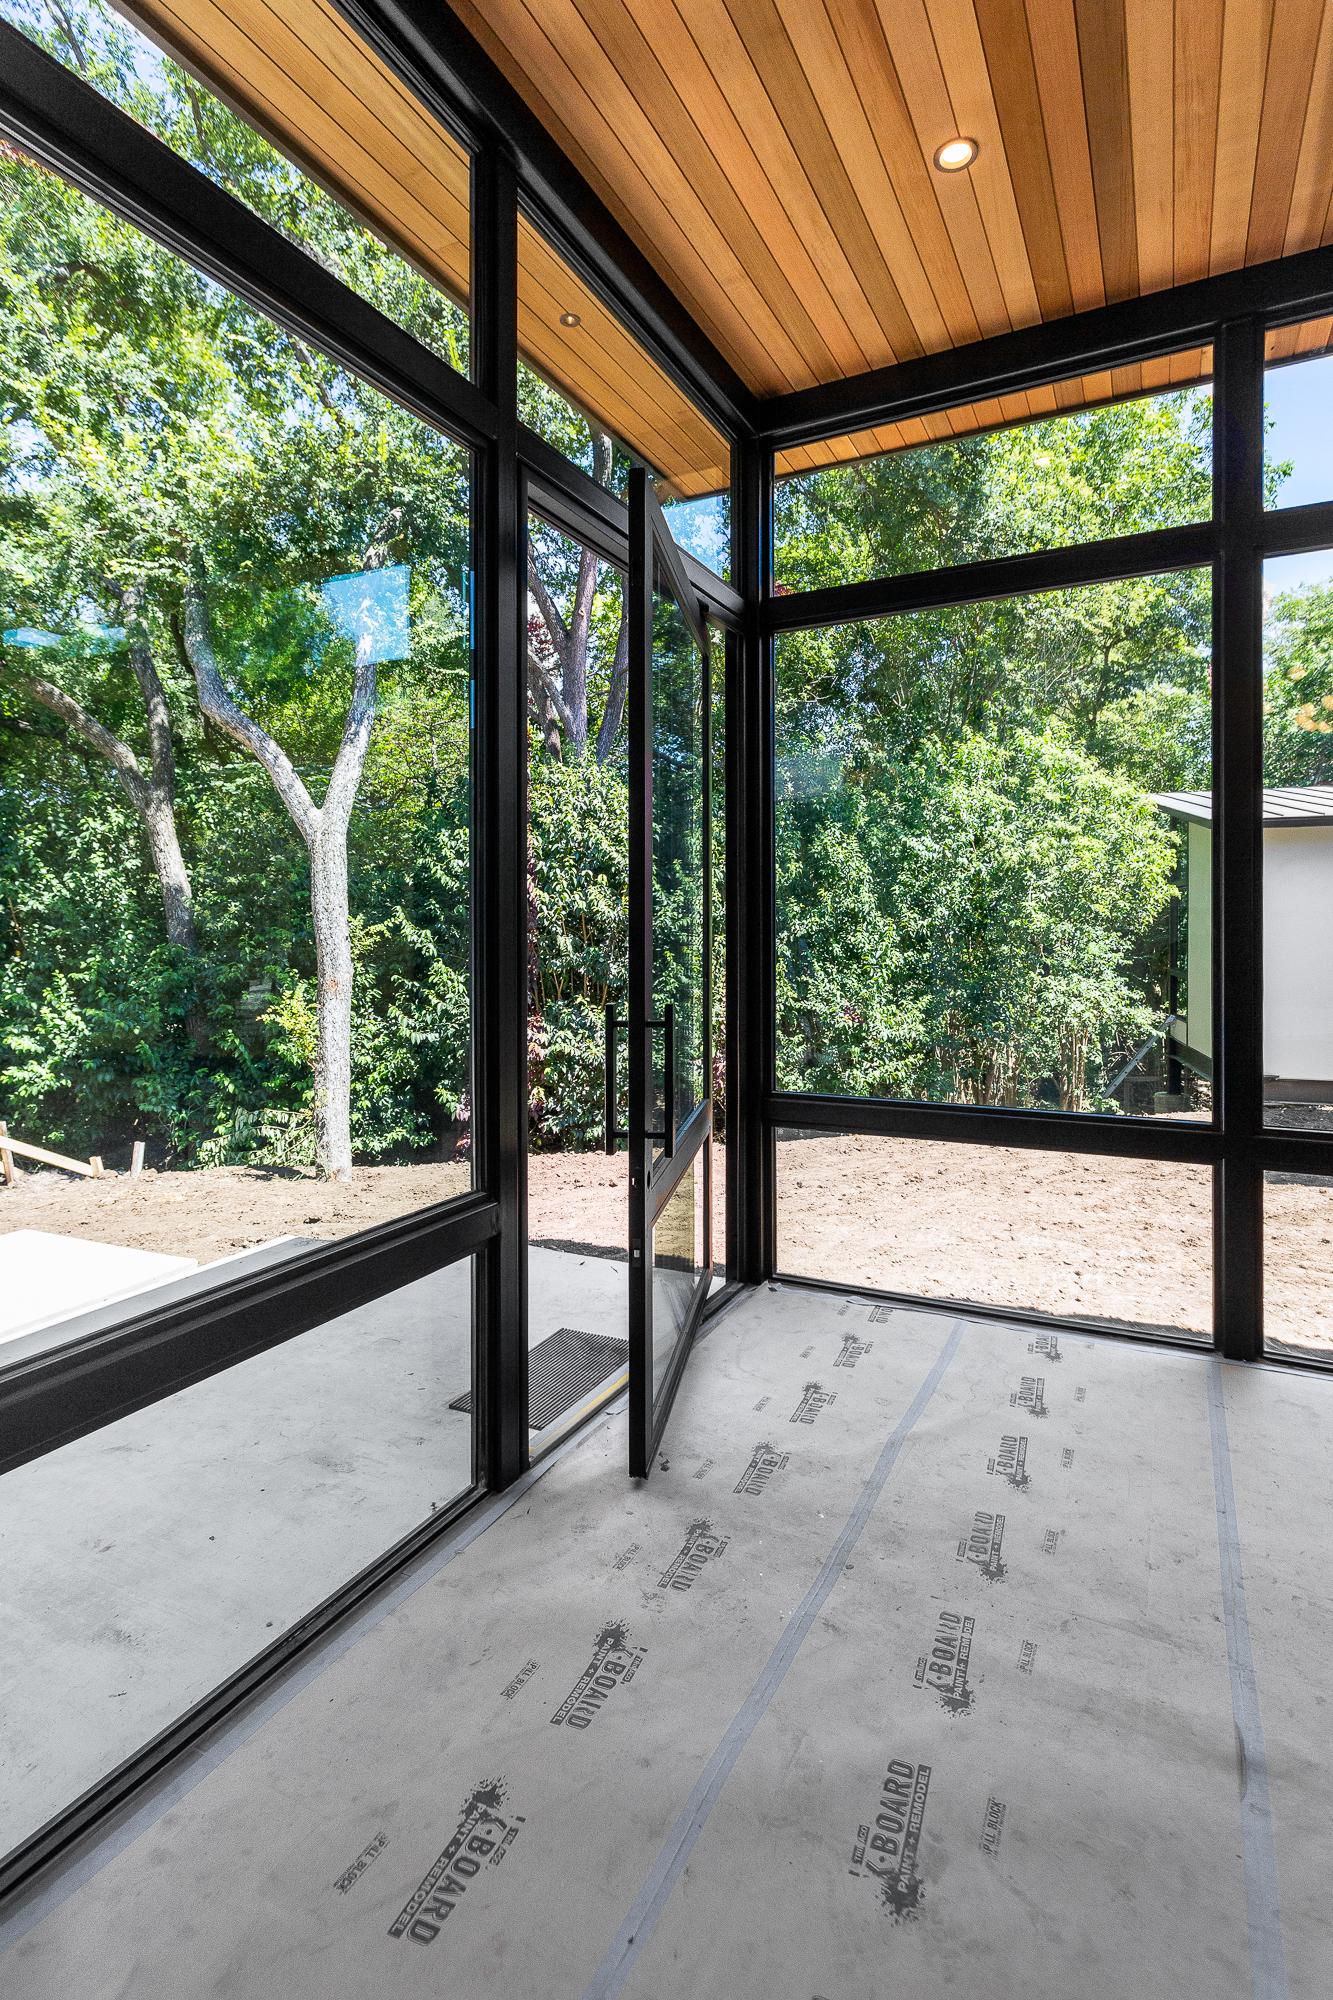 Woodridge-San-Antonio-Architecture-Photography-6.jpg